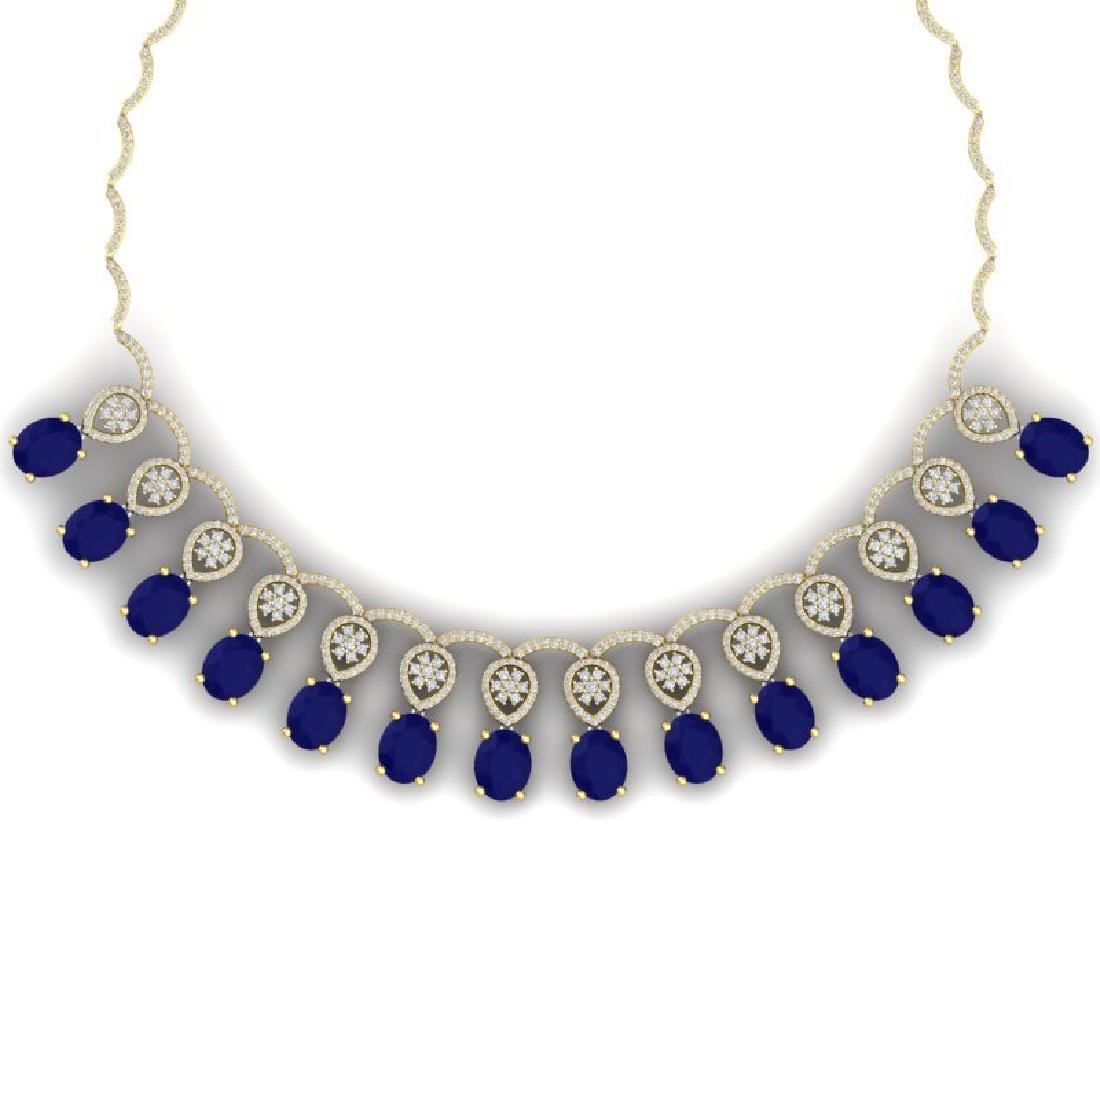 54.05 CTW Royalty Sapphire & VS Diamond Necklace 18K